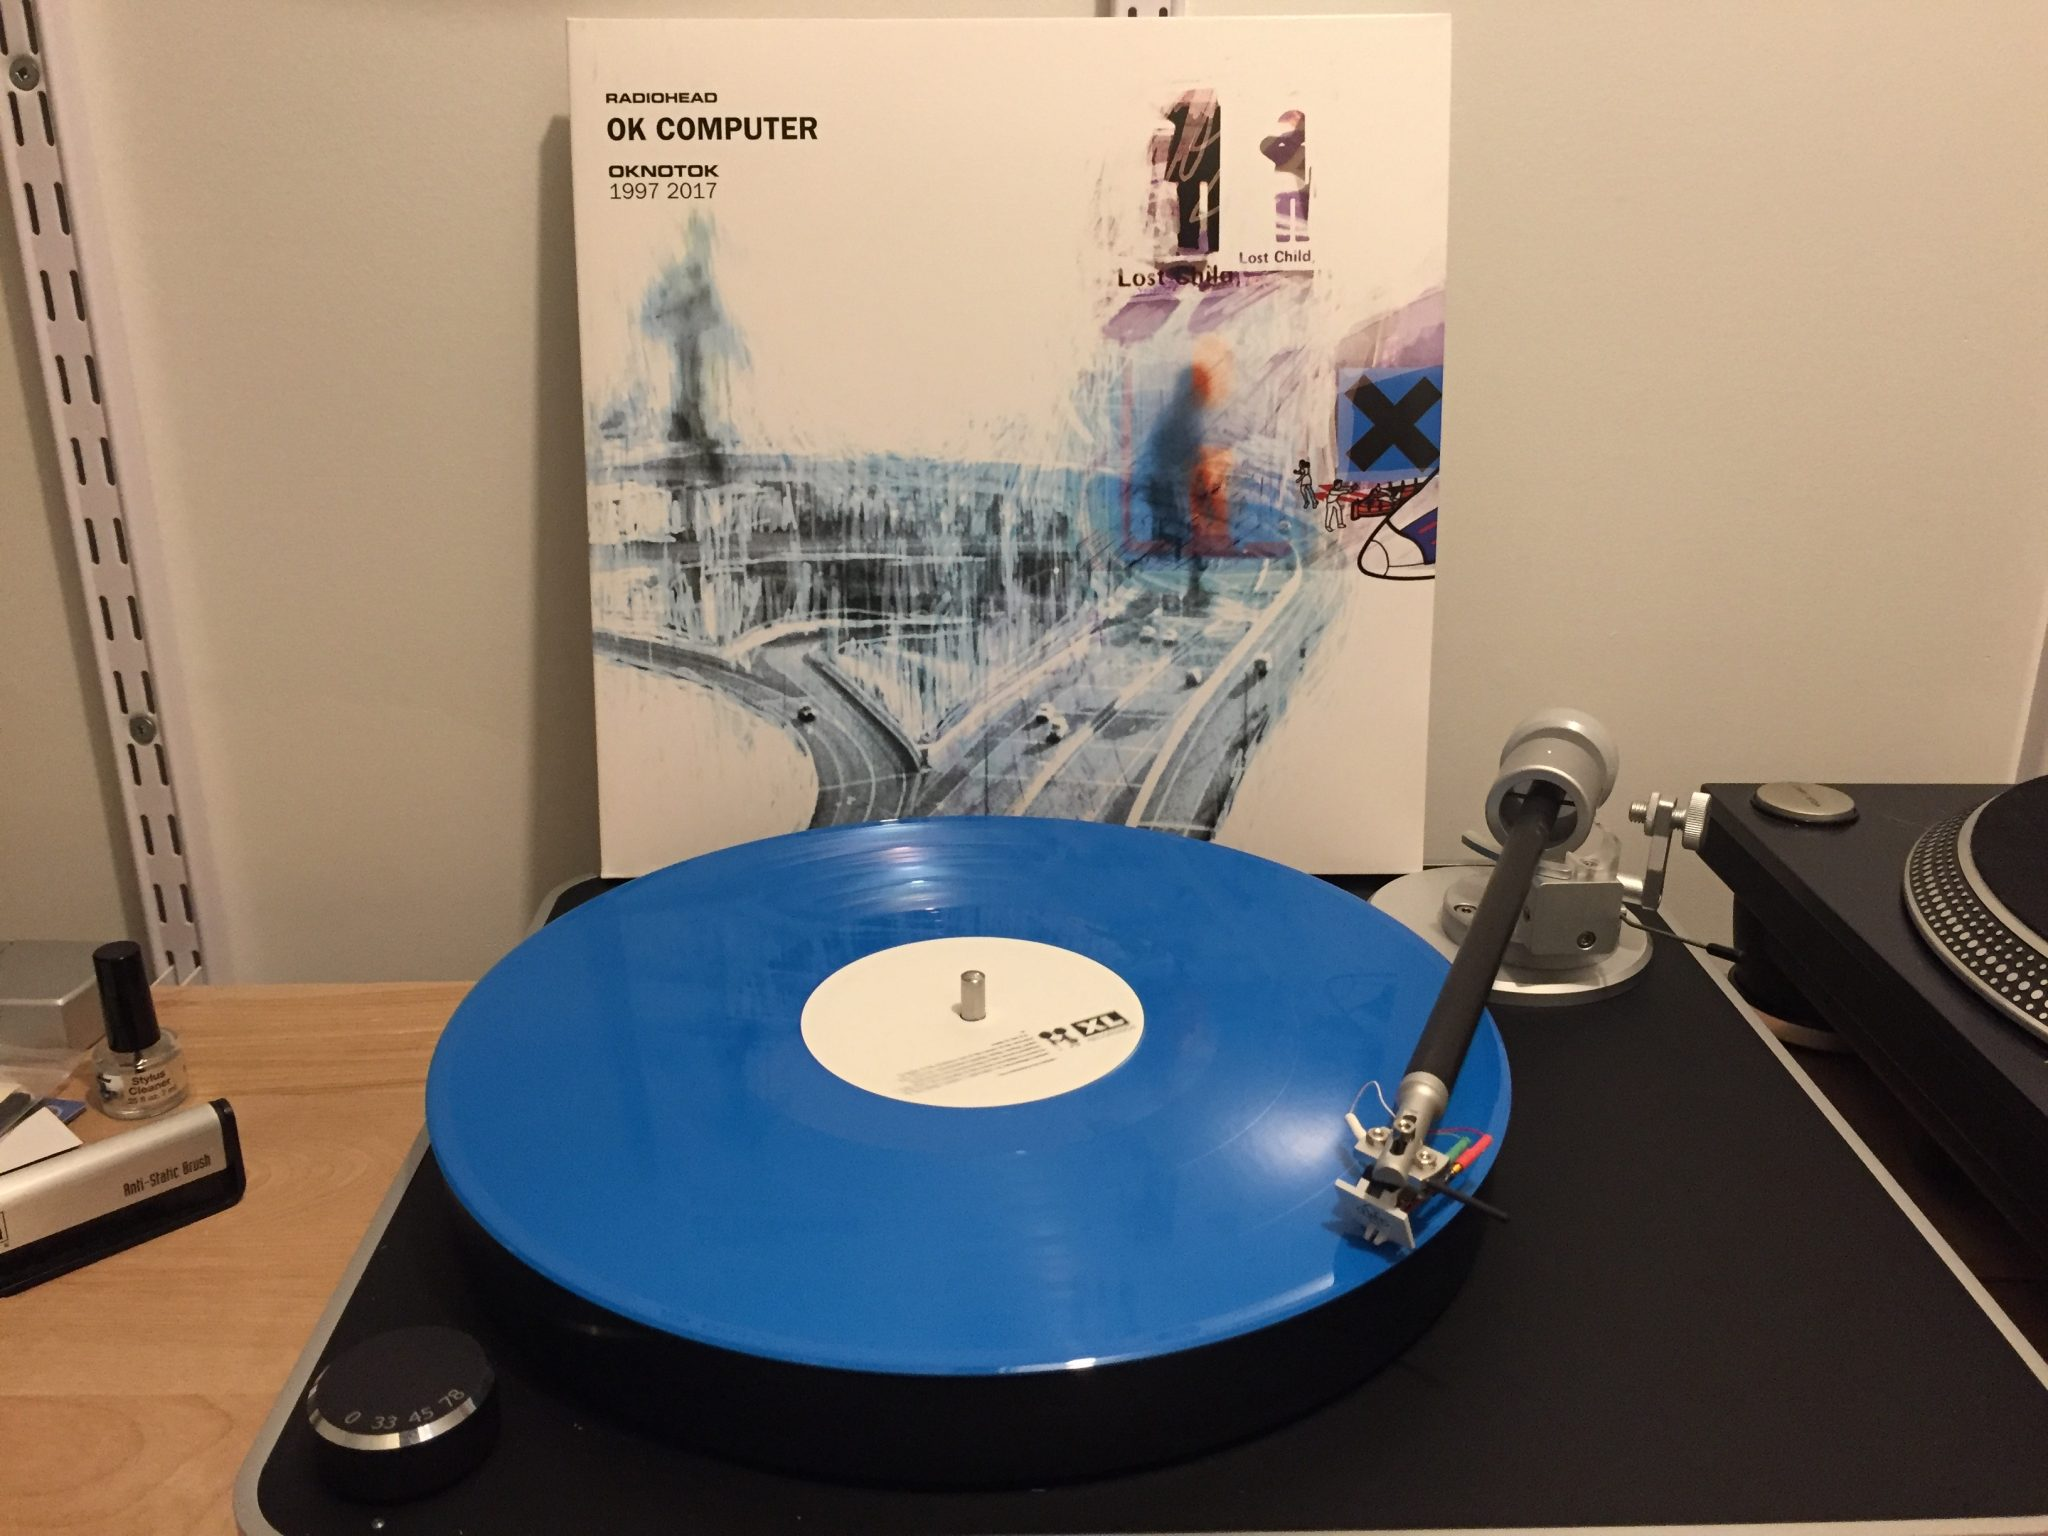 e8c5143cfd281c Réédition: Radiohead – OK Computer – OKNOTOK 1997 2017